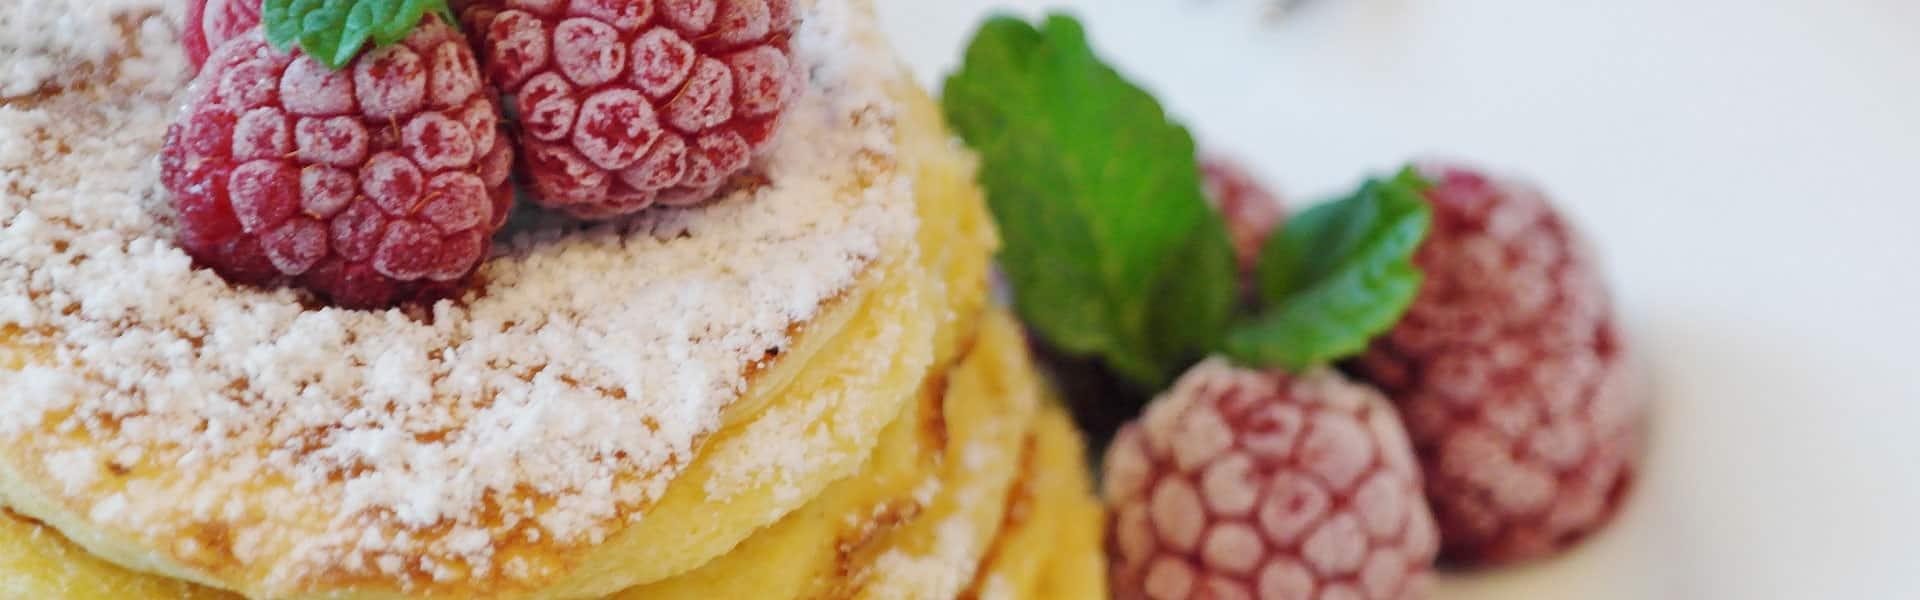 pancake e lamponi